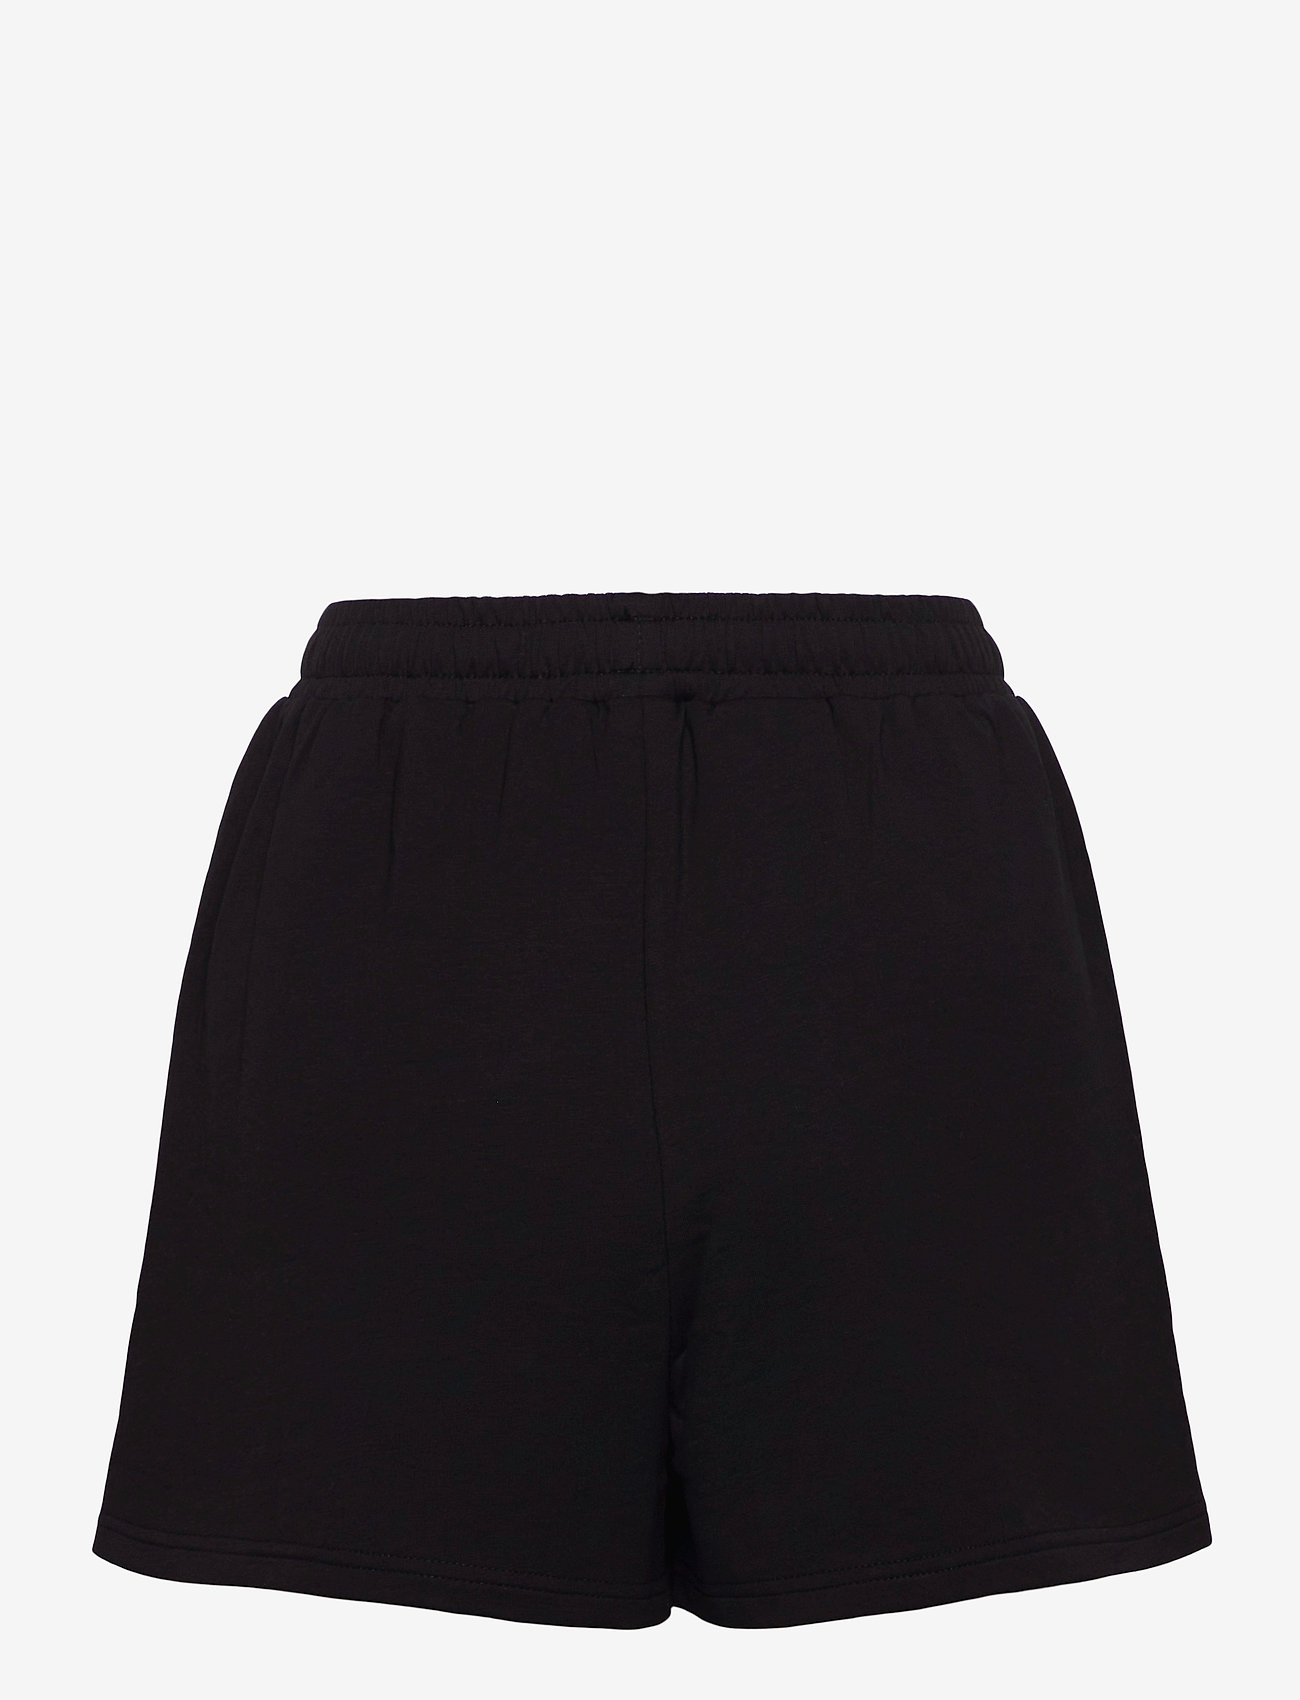 FILA - EDEL shorts high waist - chaussures de course - black - 1